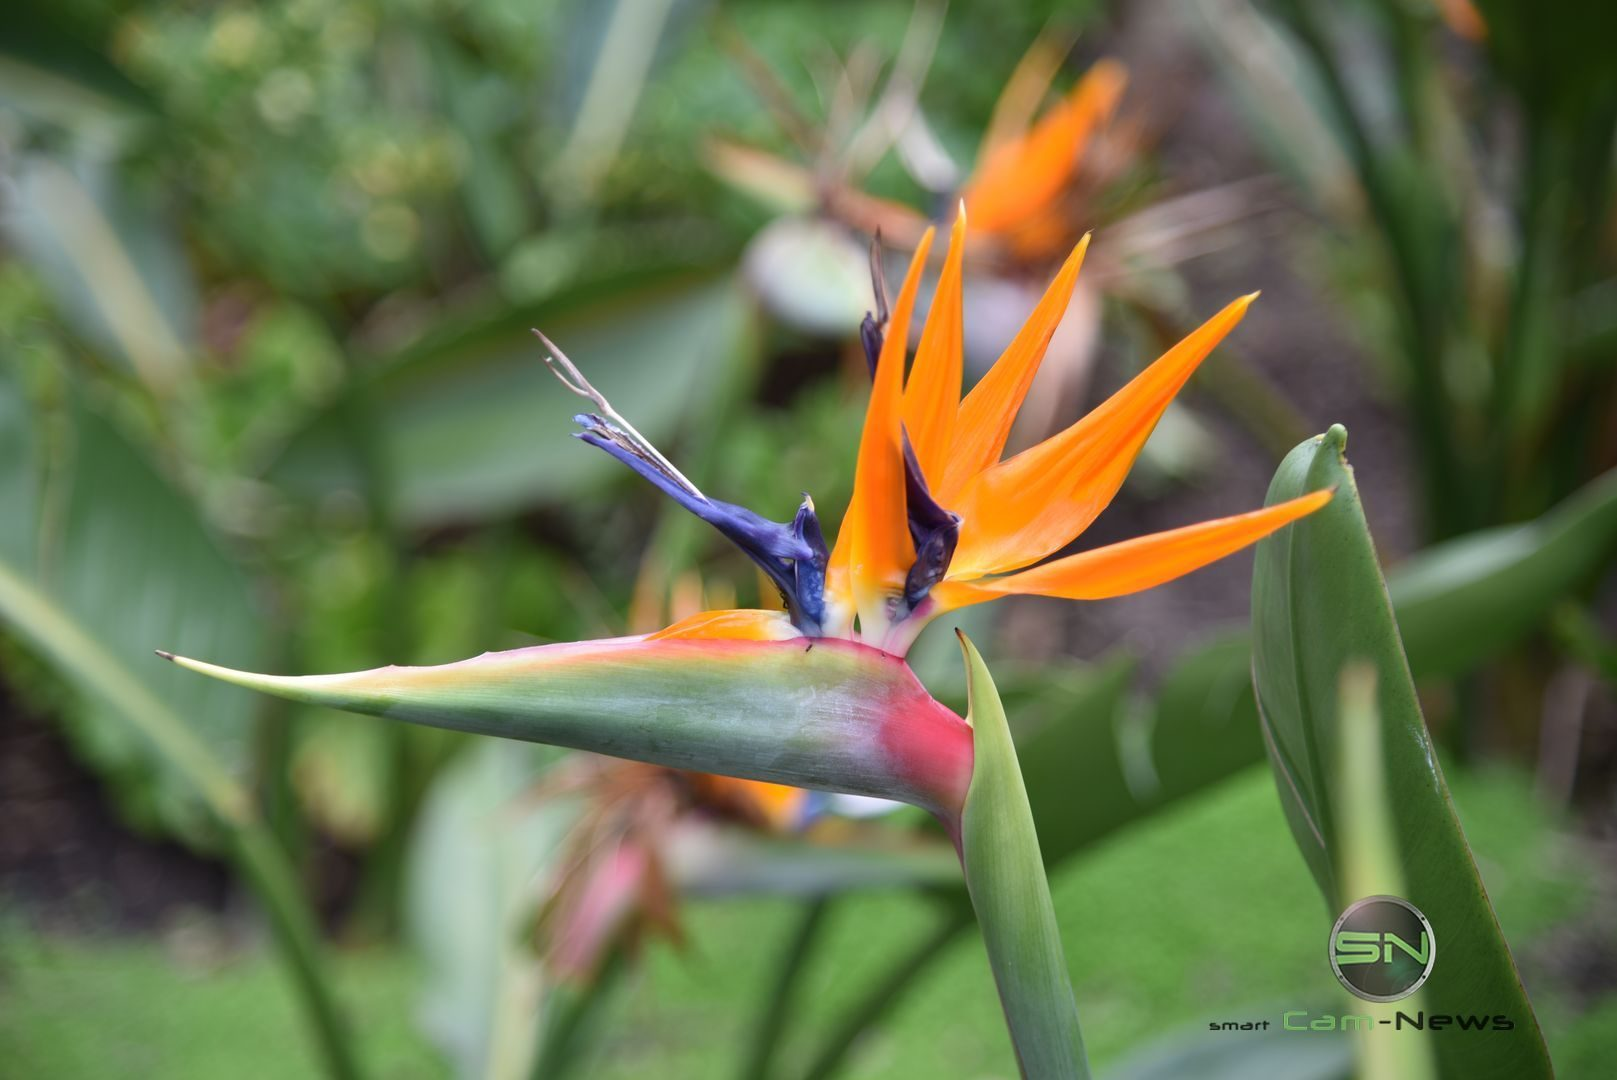 Blumen - Neuseeland - Nikon D750 - SmartCamNews